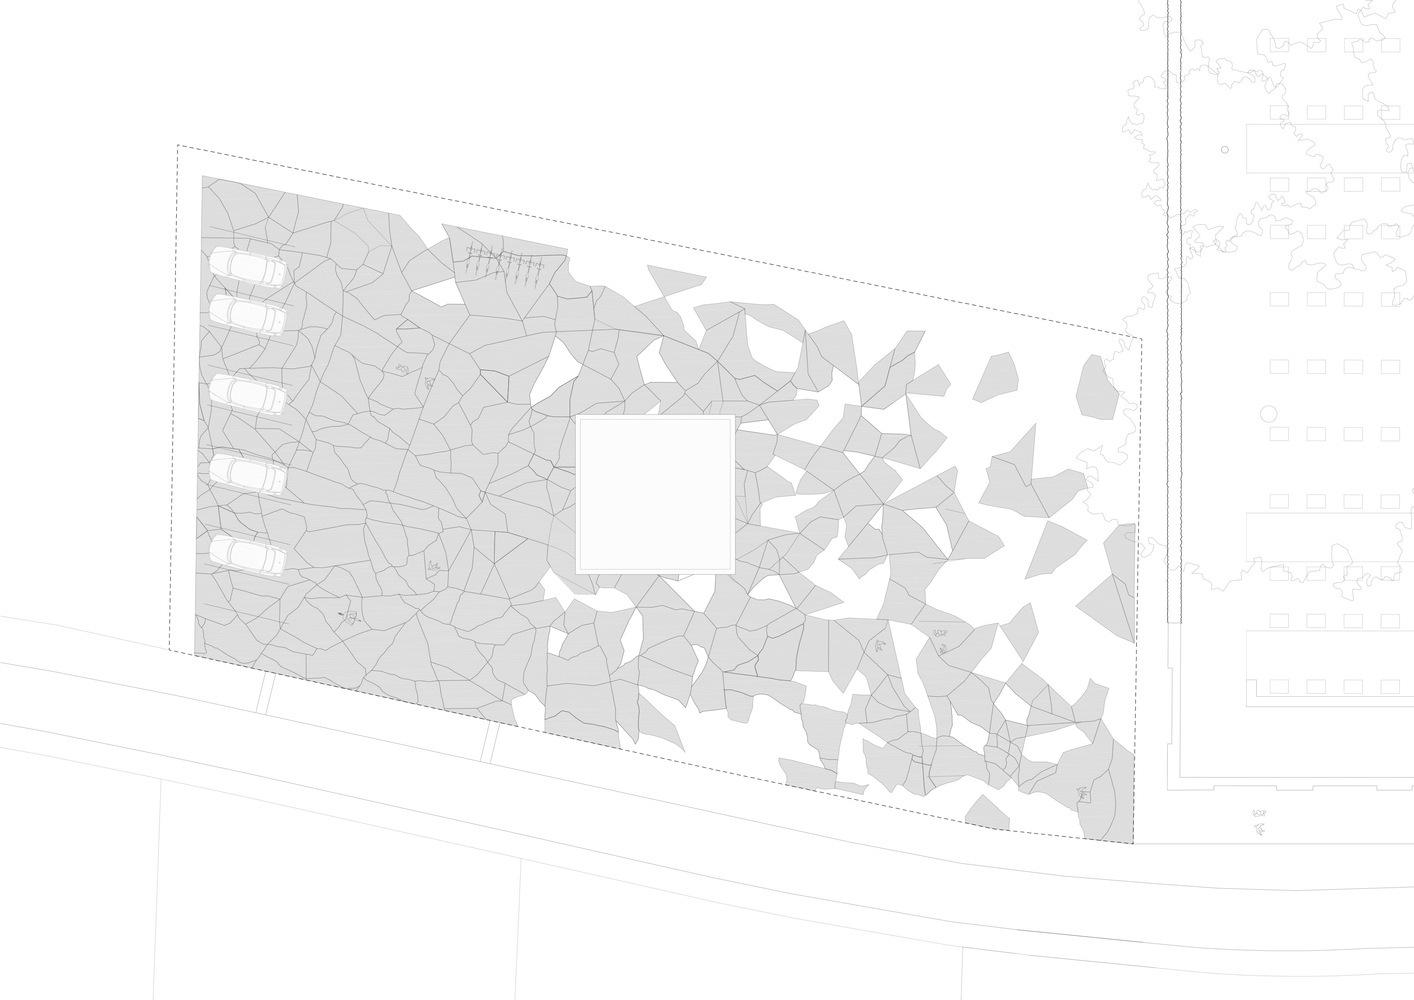 archaic_GijsVanVaerenbergh_6VaultsPavilion_4.jpg